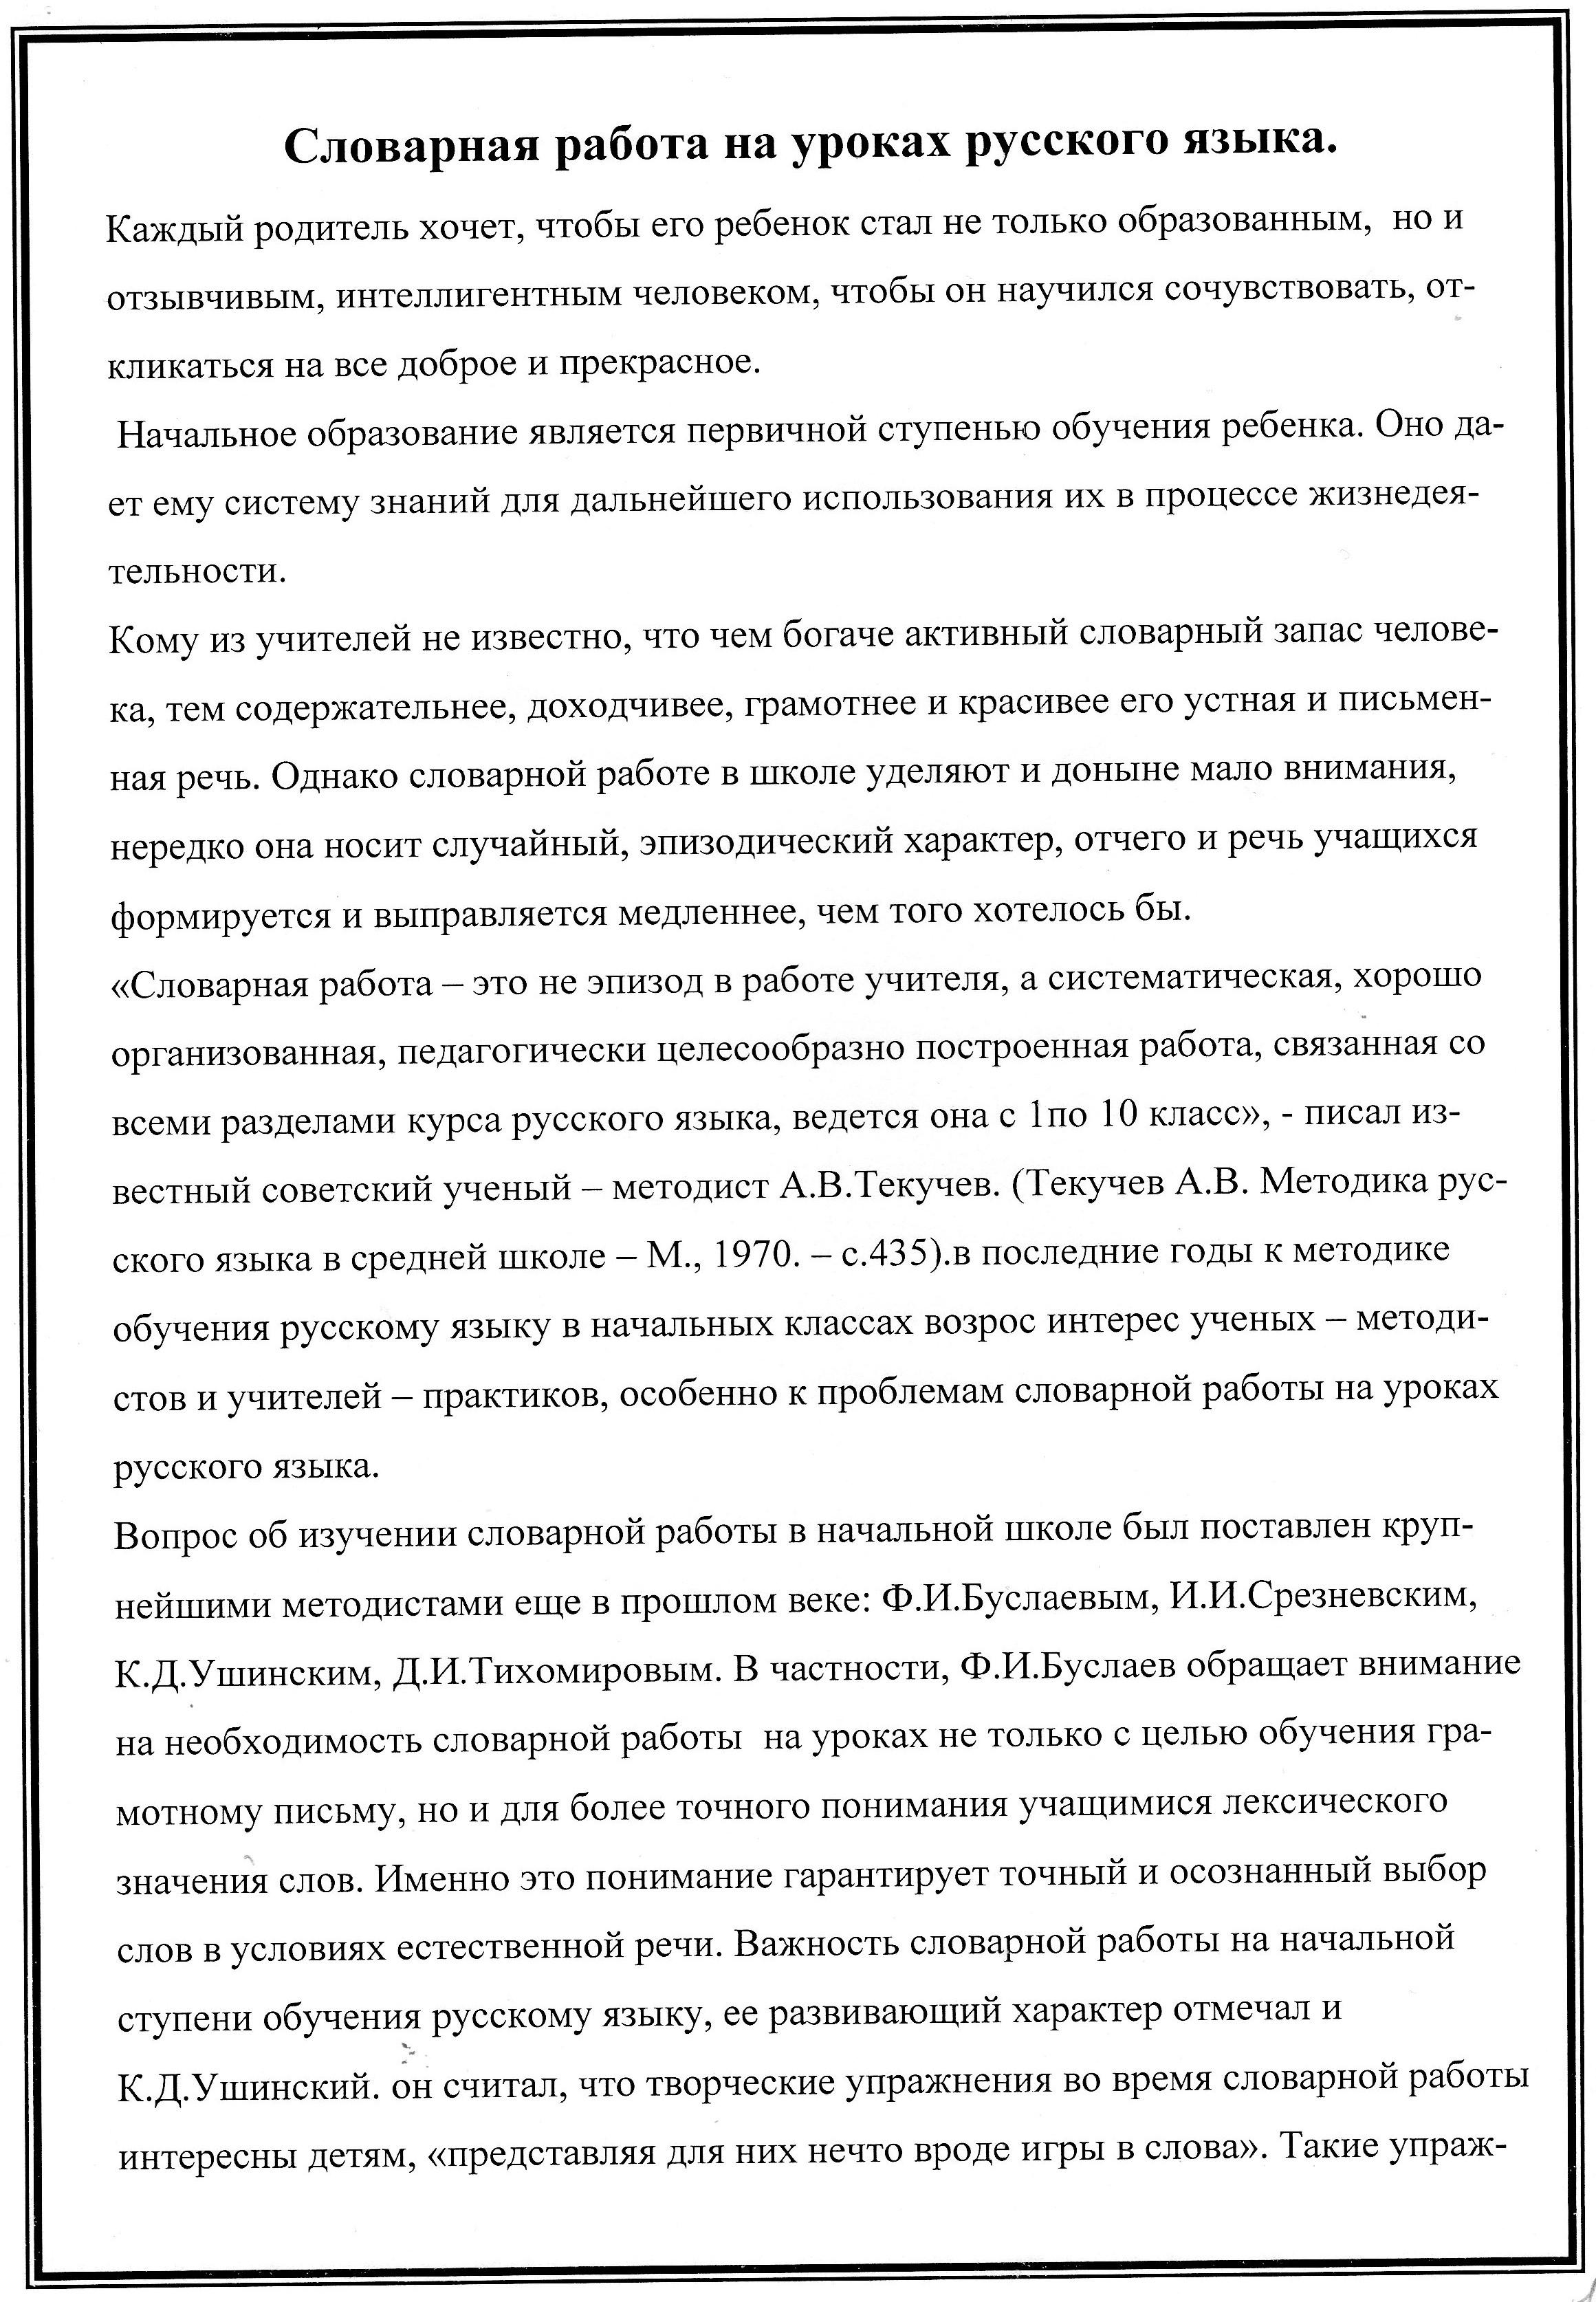 Актуальные темы для доклада по русскому языку 3854